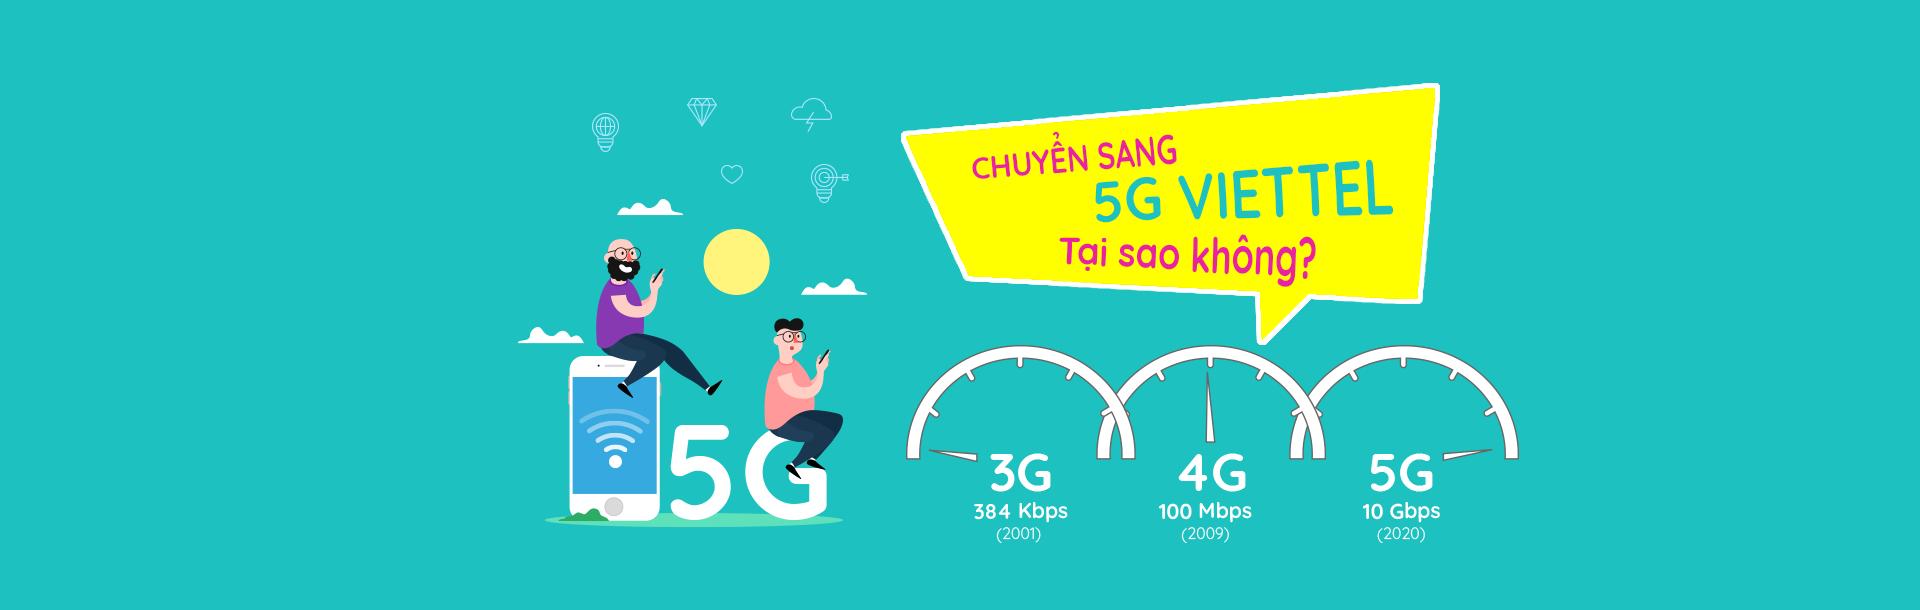 Slider 3 – Chuyen sang 5G Viettel Tai sao khong